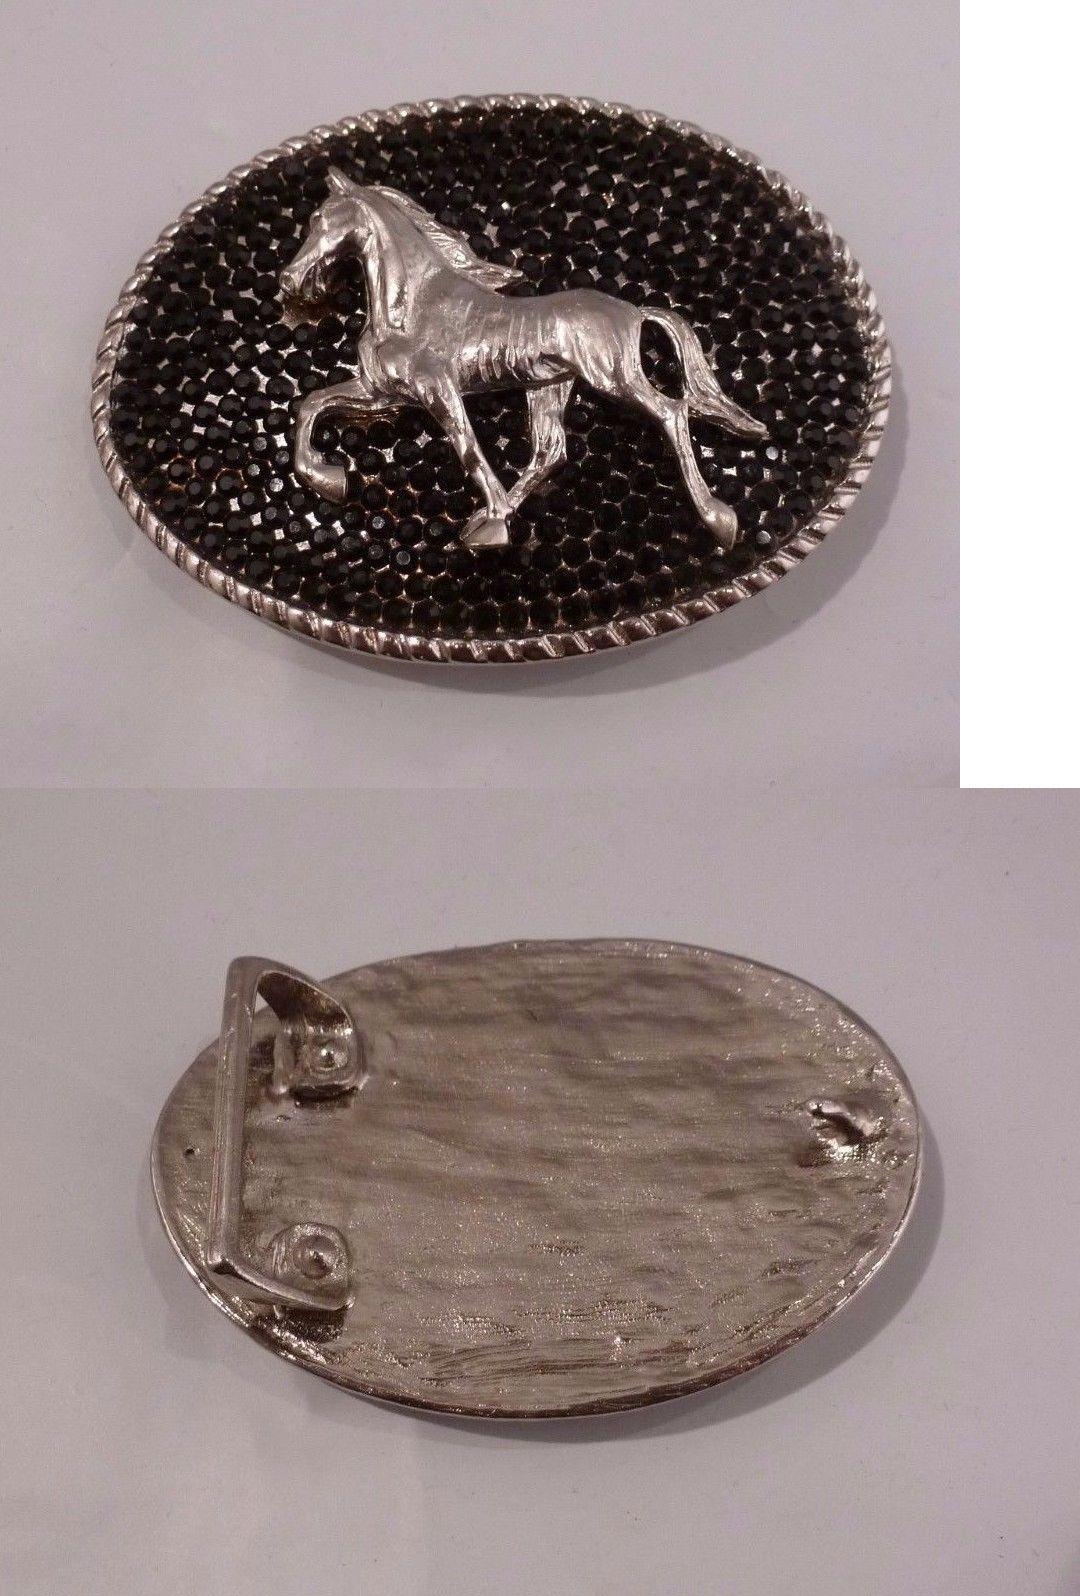 Belt Buckles 163573: Rhinestone Cowgirl Black Crystal Silver Horse Western Belt Buckle -> BUY IT NOW ONLY: $35 on eBay!